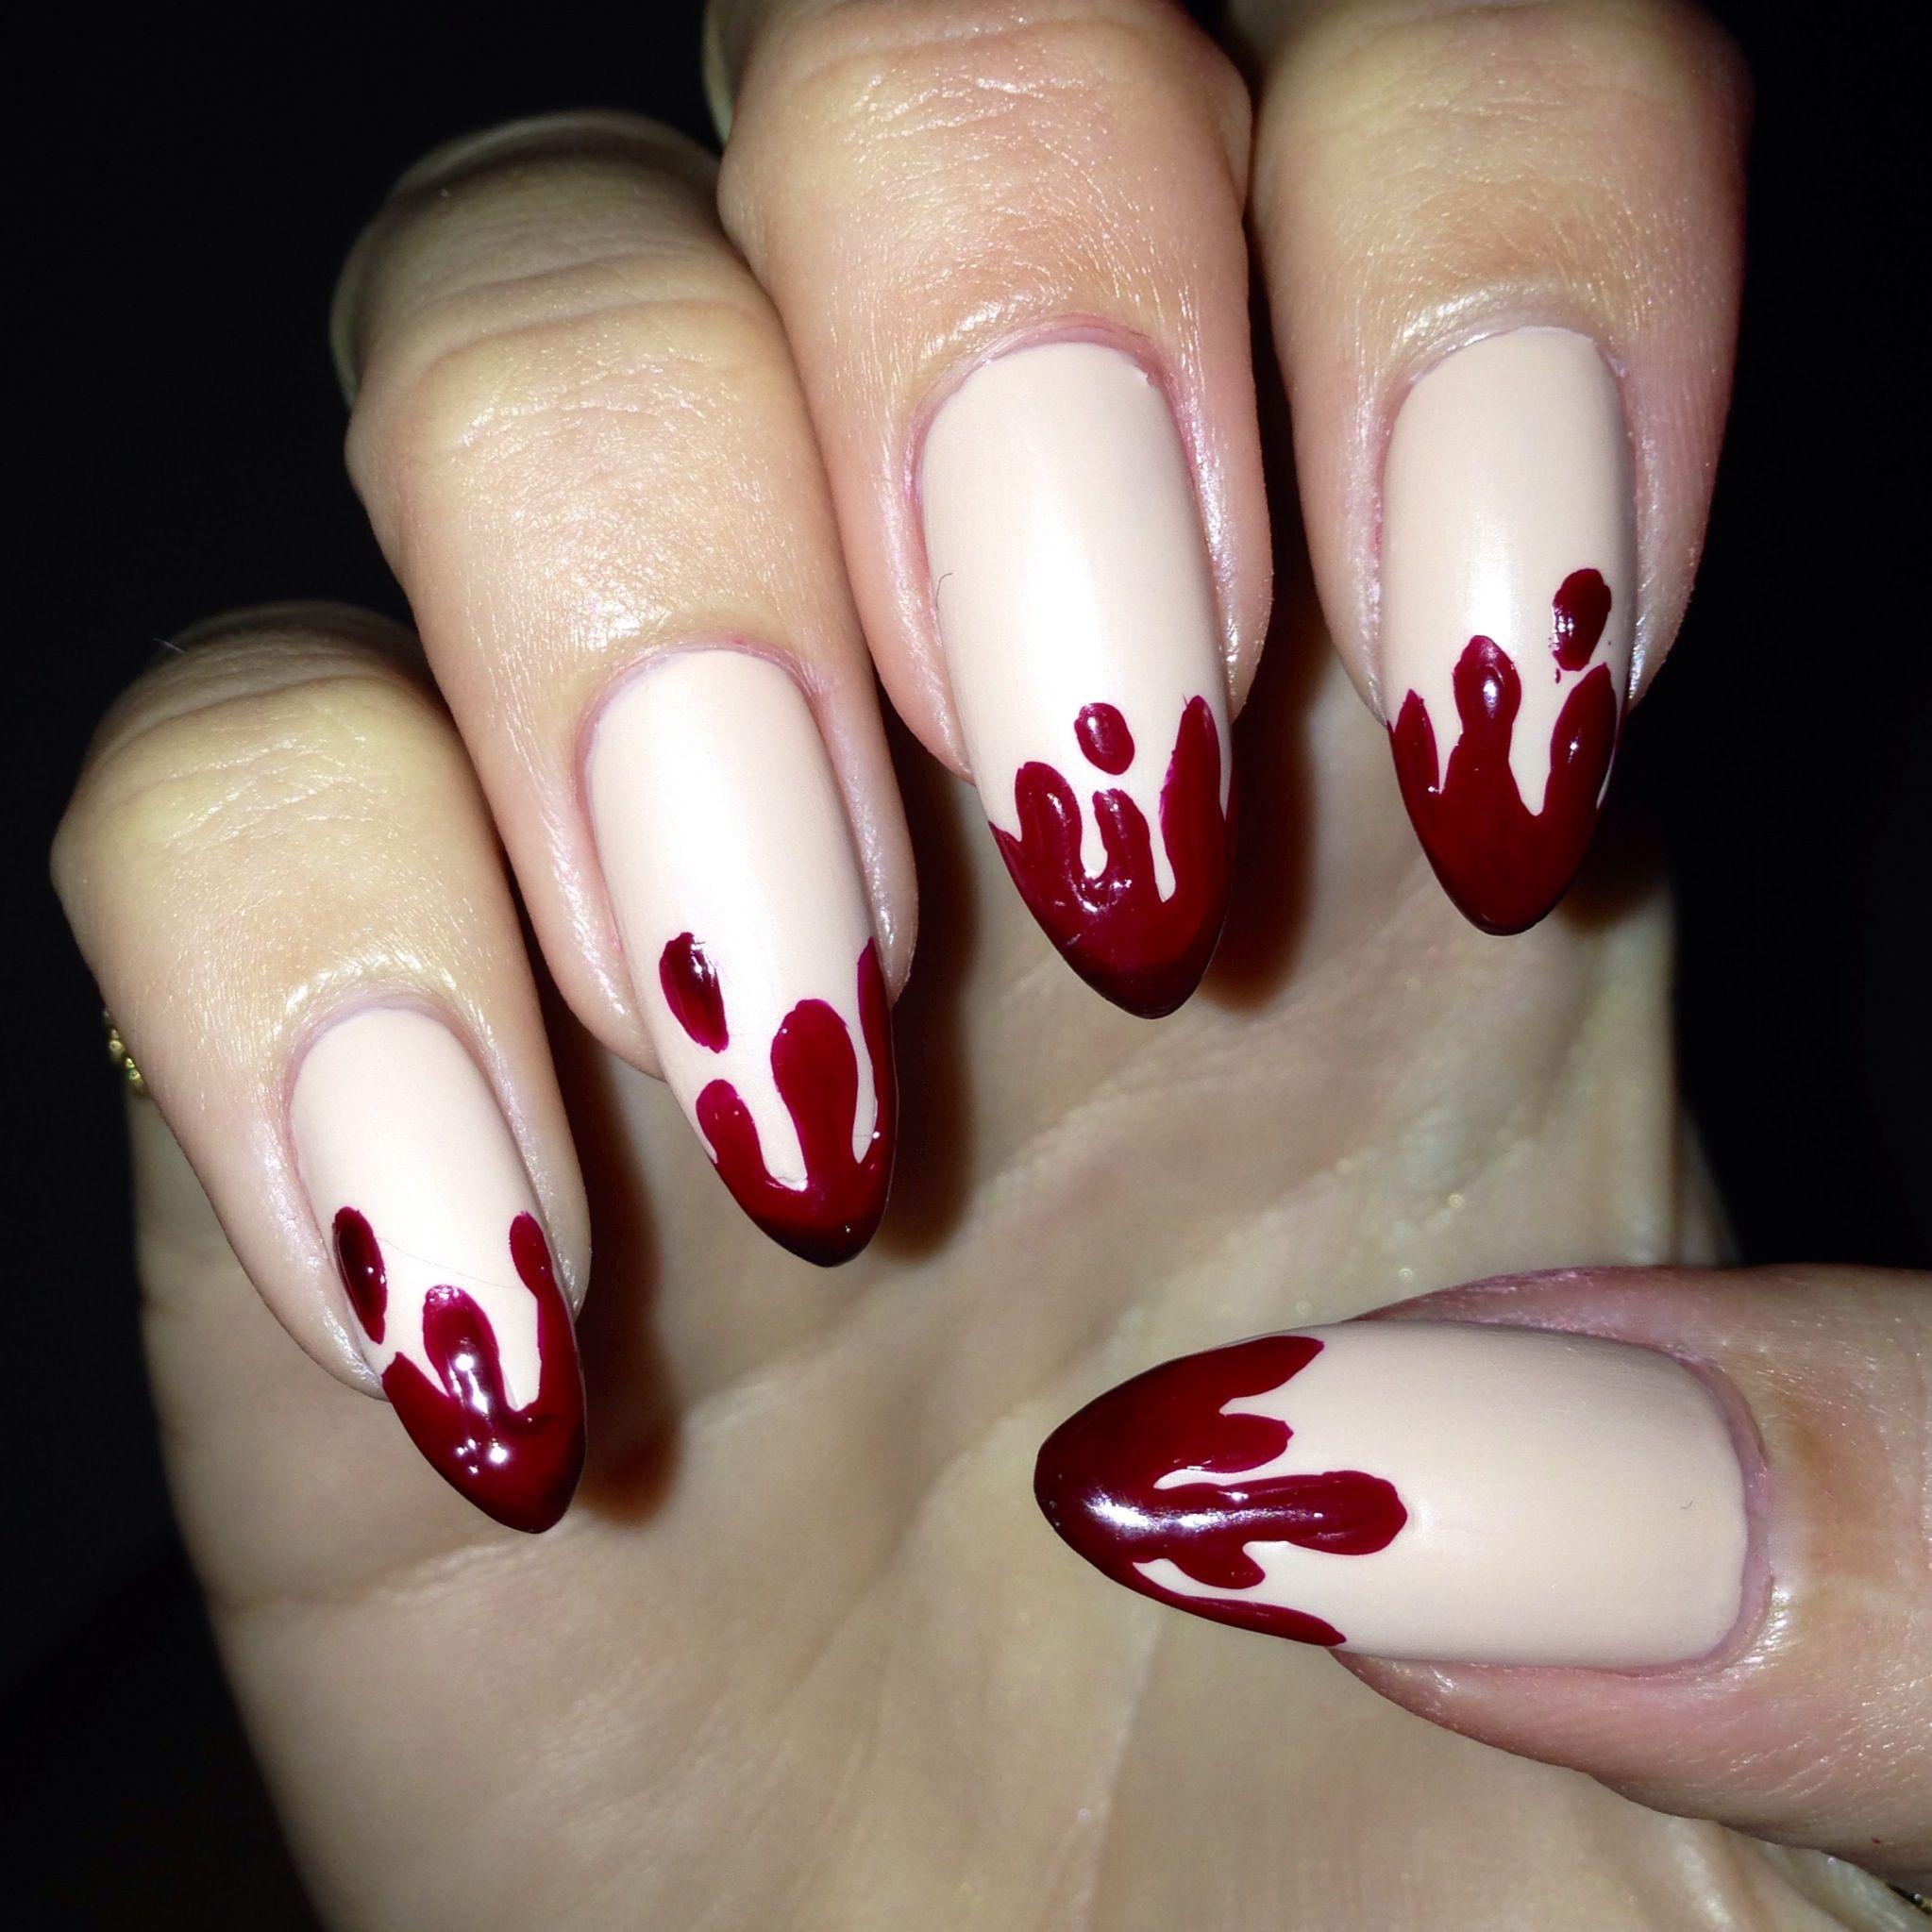 #halloweennails #halloweennailart | Pointy nail designs ...